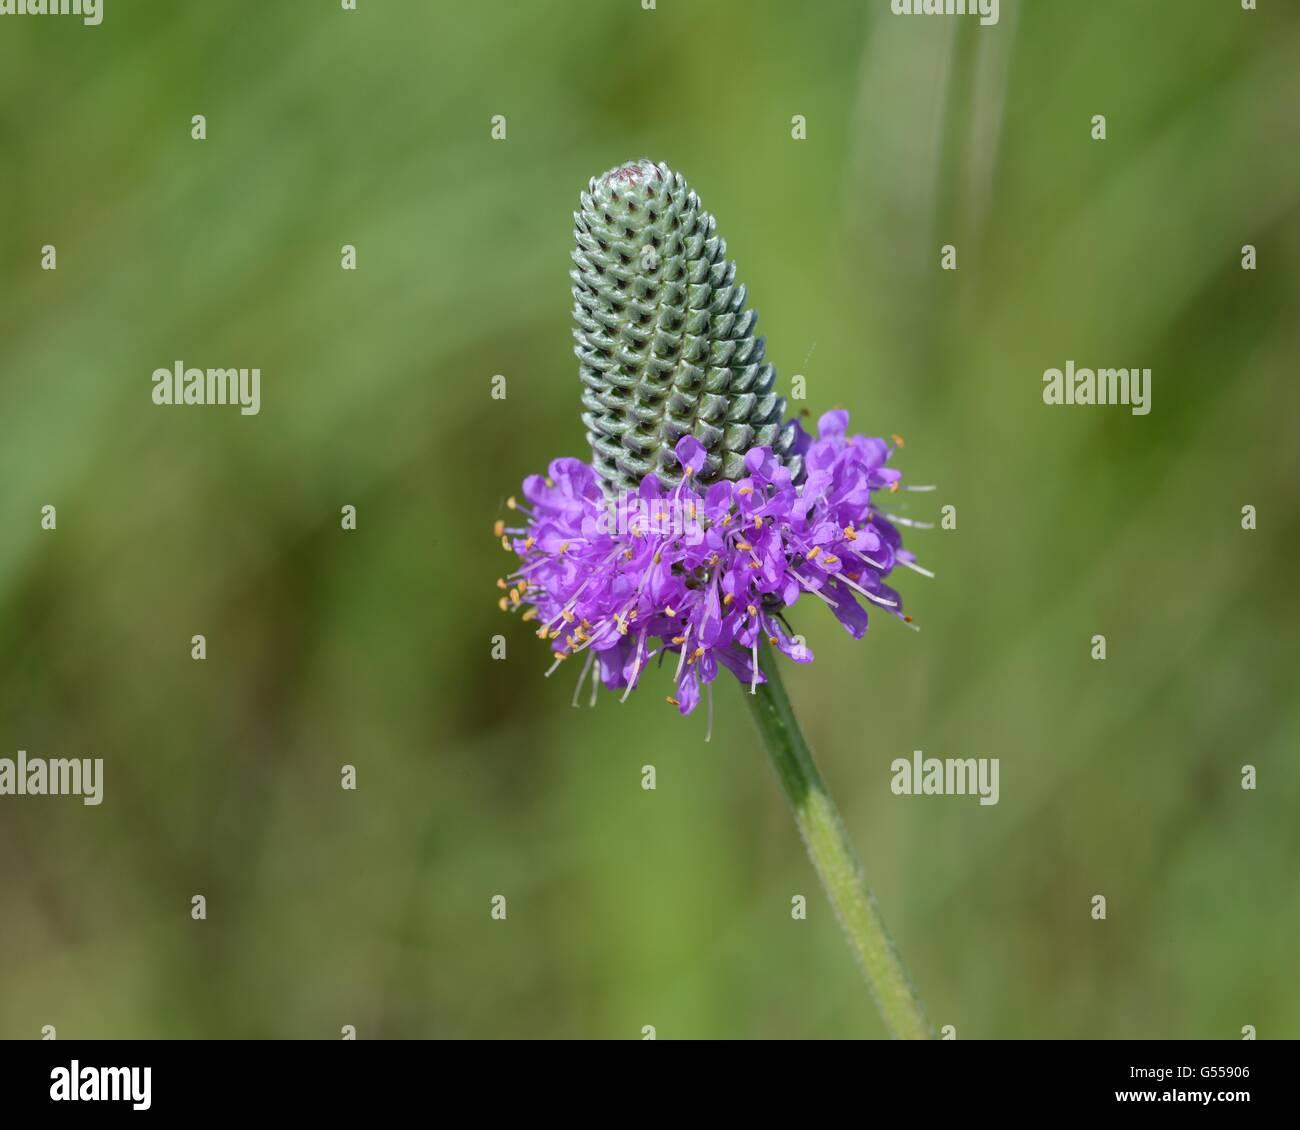 Las praderas de trébol violeta Foto de stock